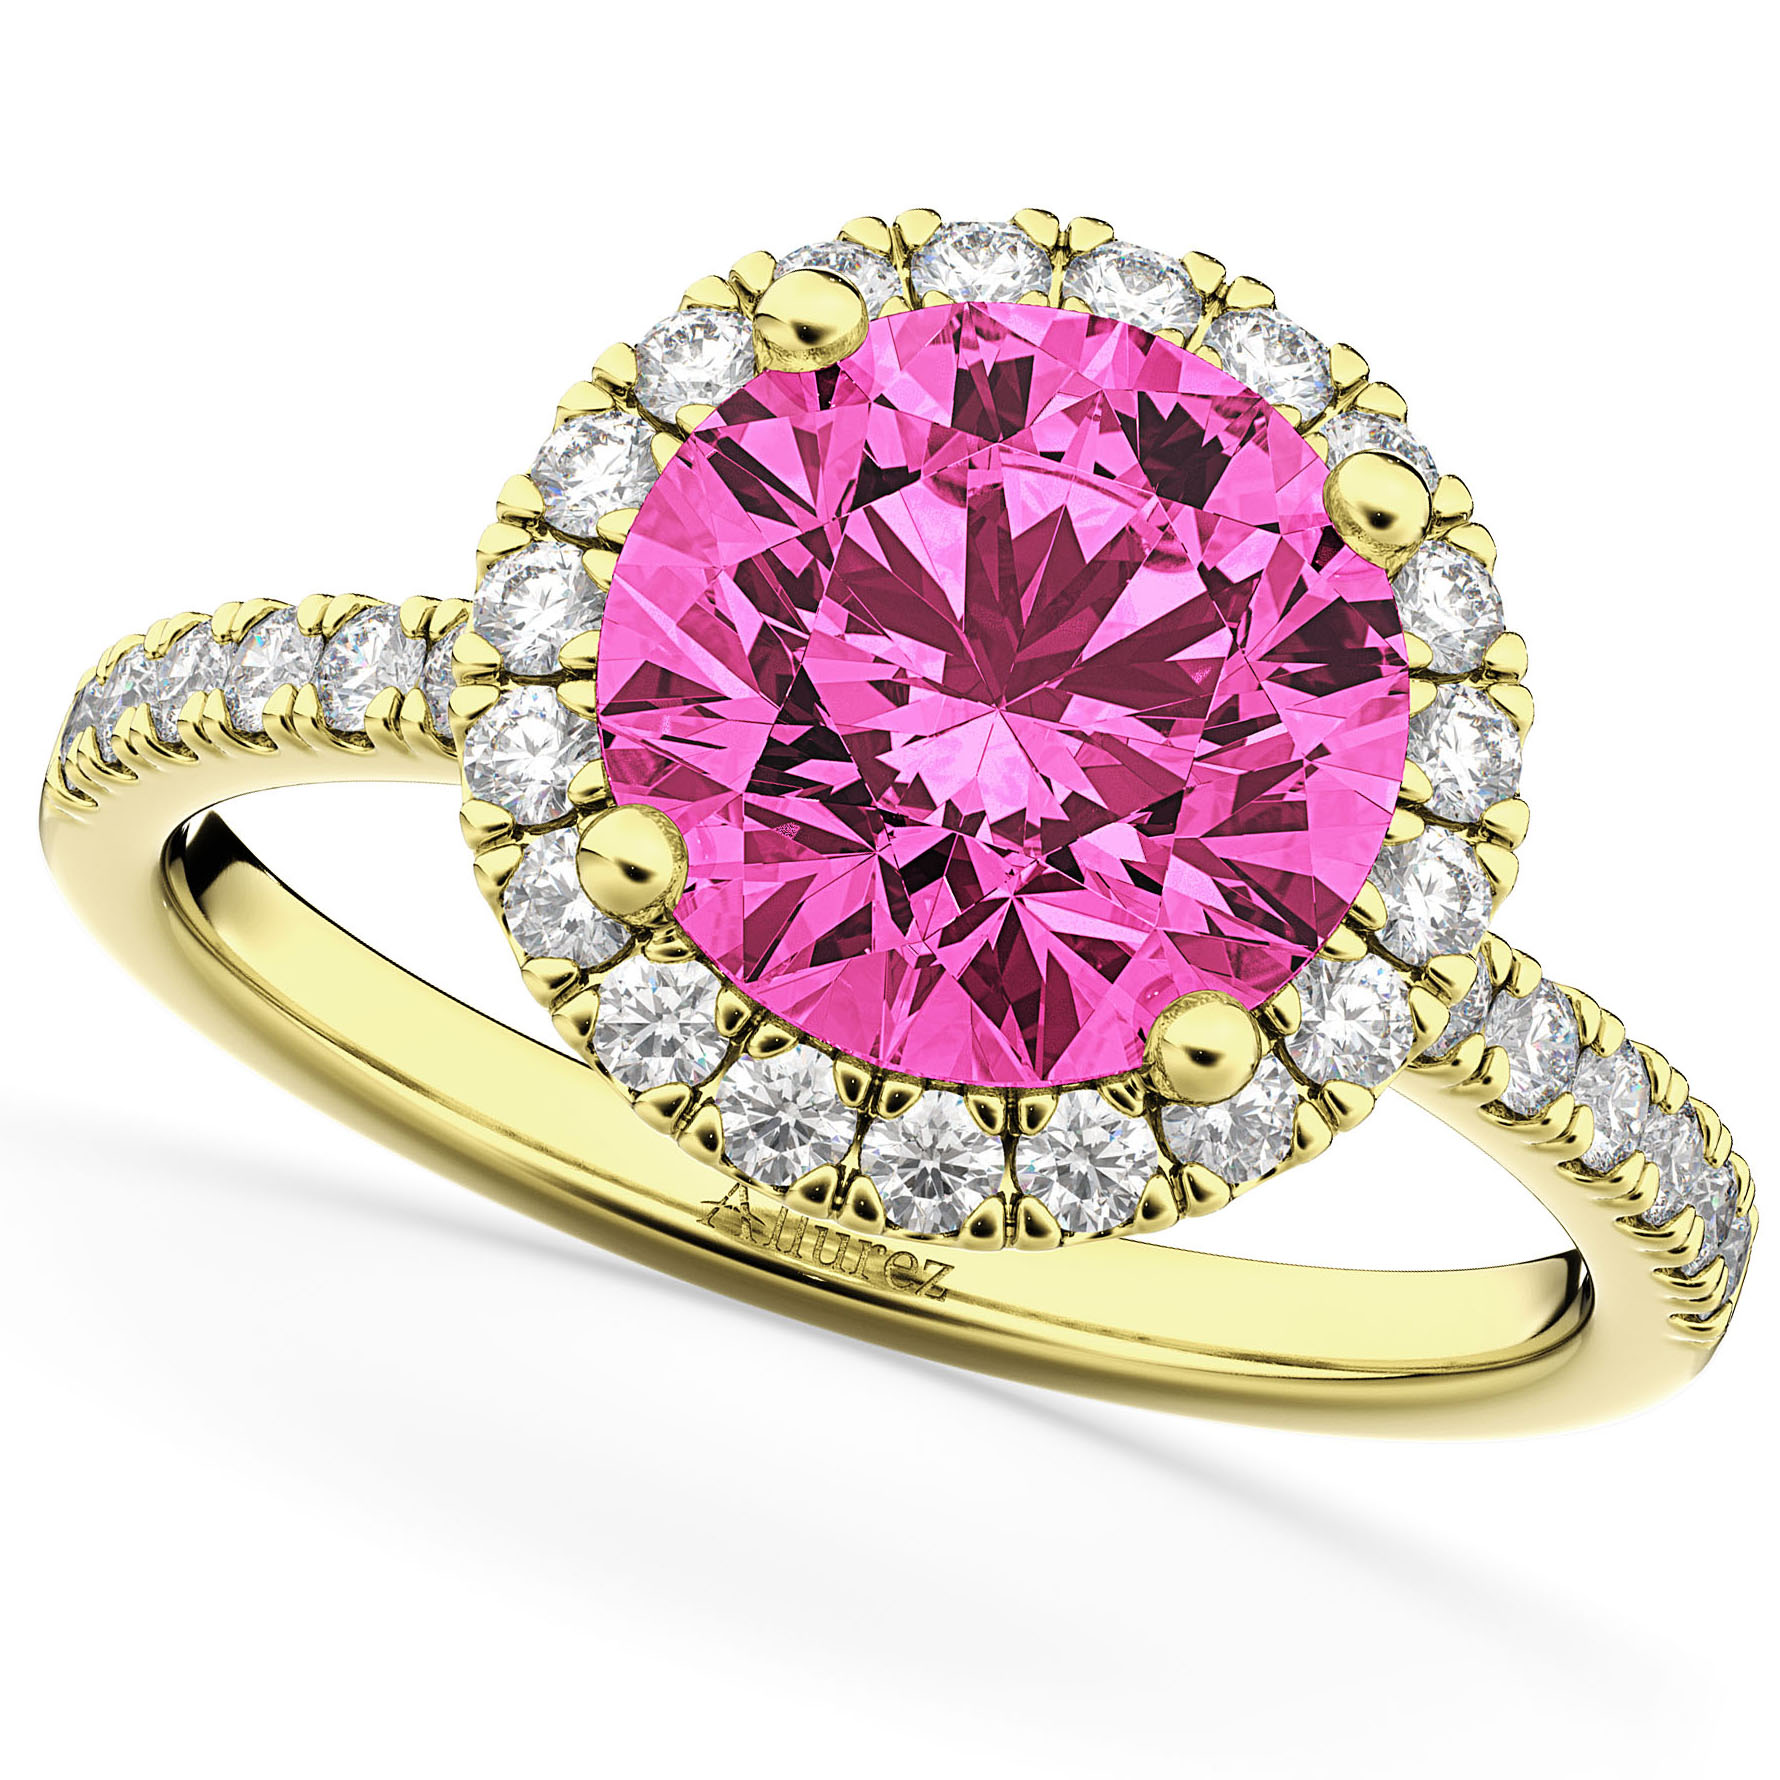 Halo Pink Tourmaline & Diamond Engagement Ring 14K Yellow Gold 2.50ct